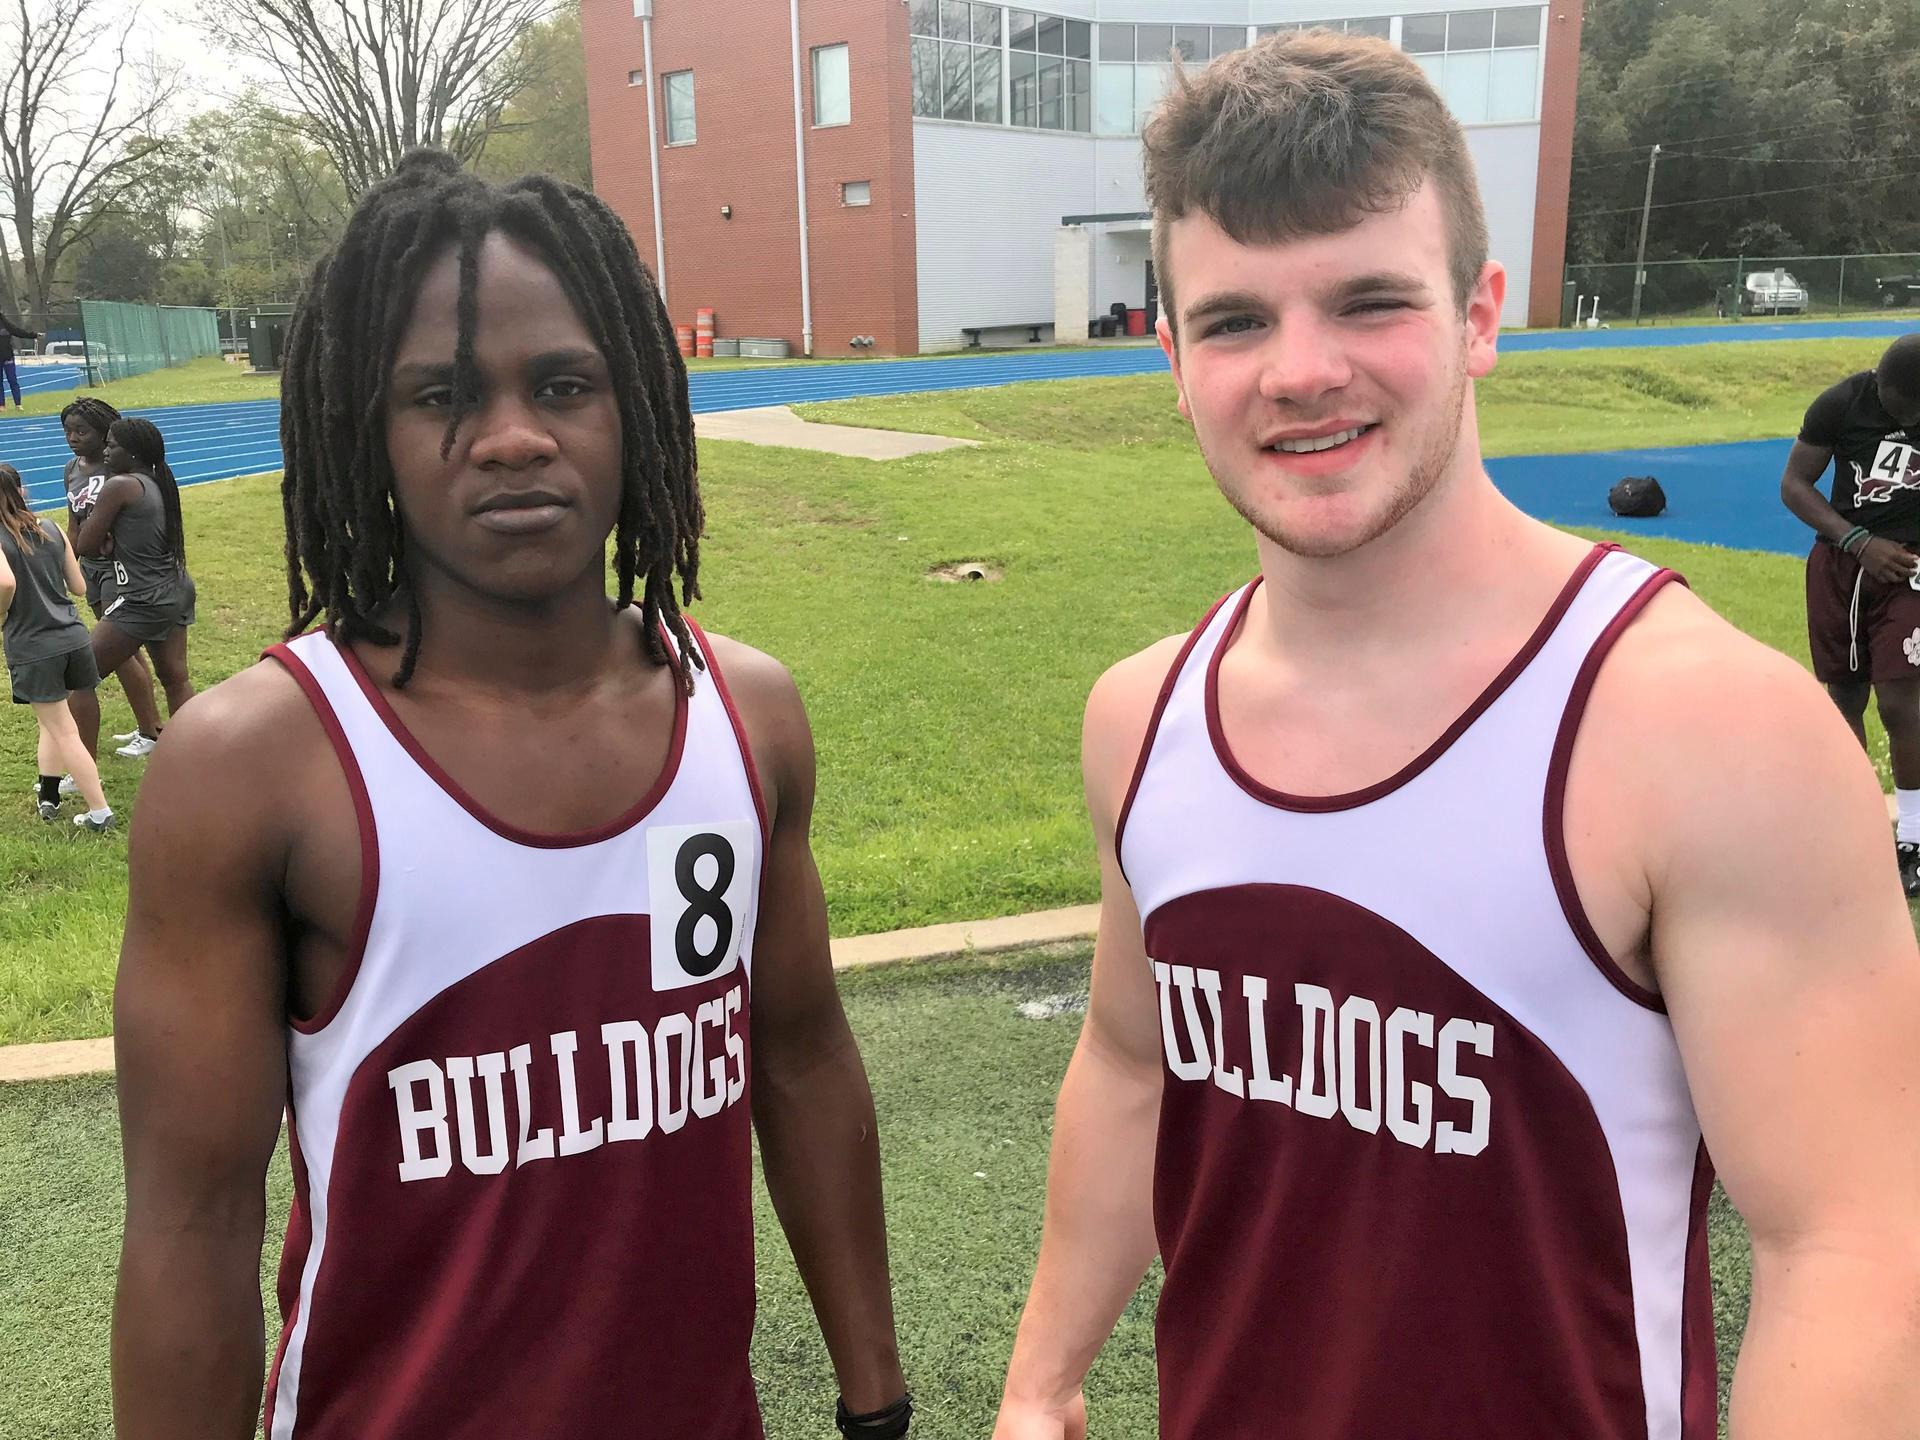 Clarkdale High Track & Field Team Members